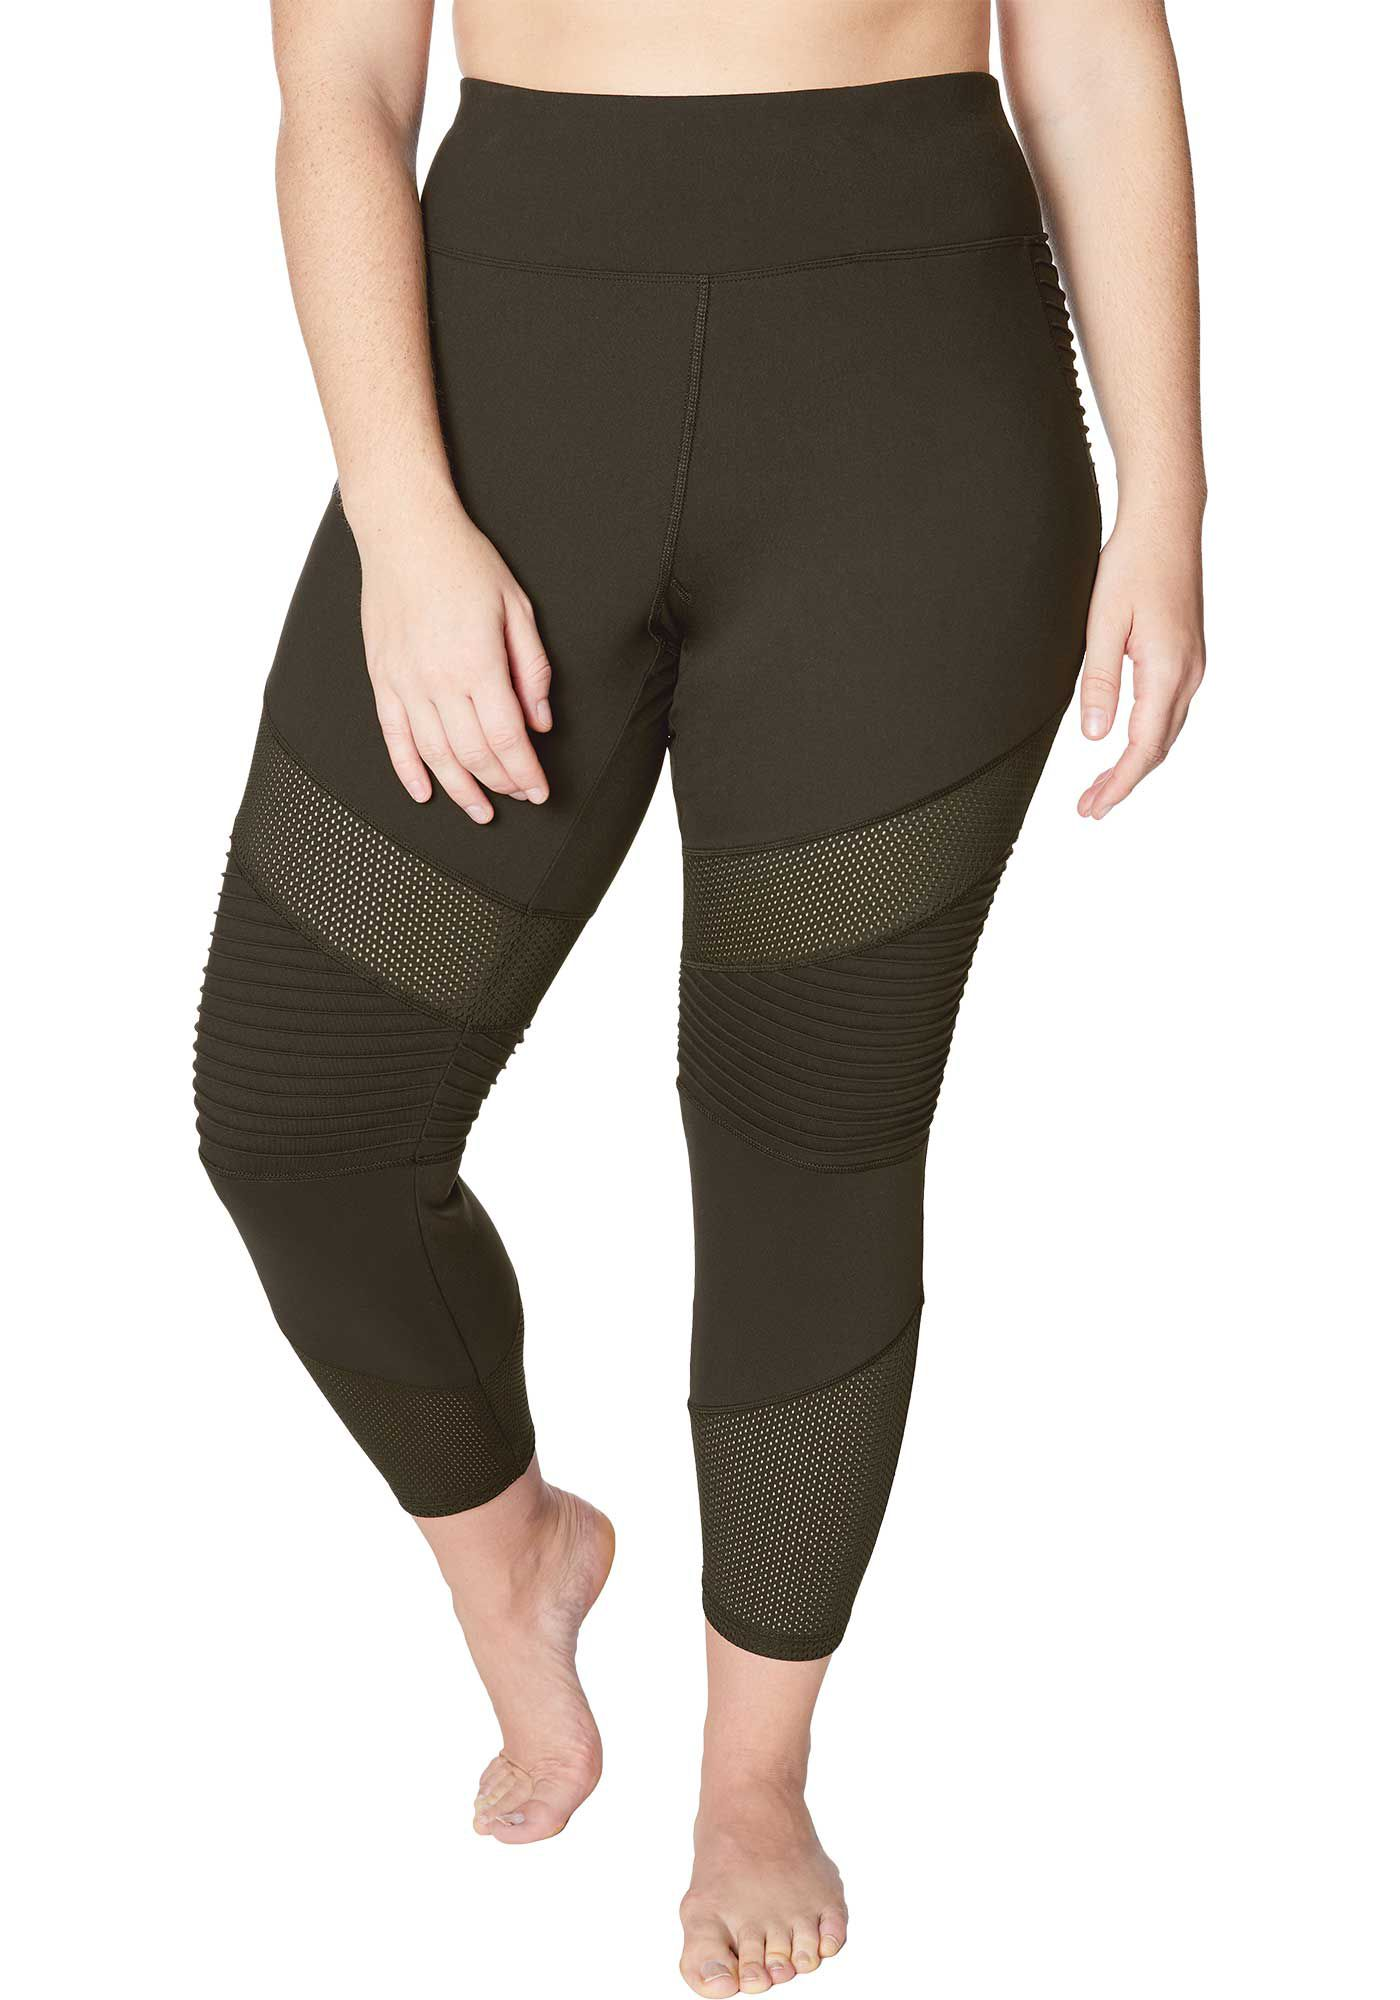 Betsey Johnson Performance Women's Plus Size Pintuck Mesh Panel 7/8 Leggings